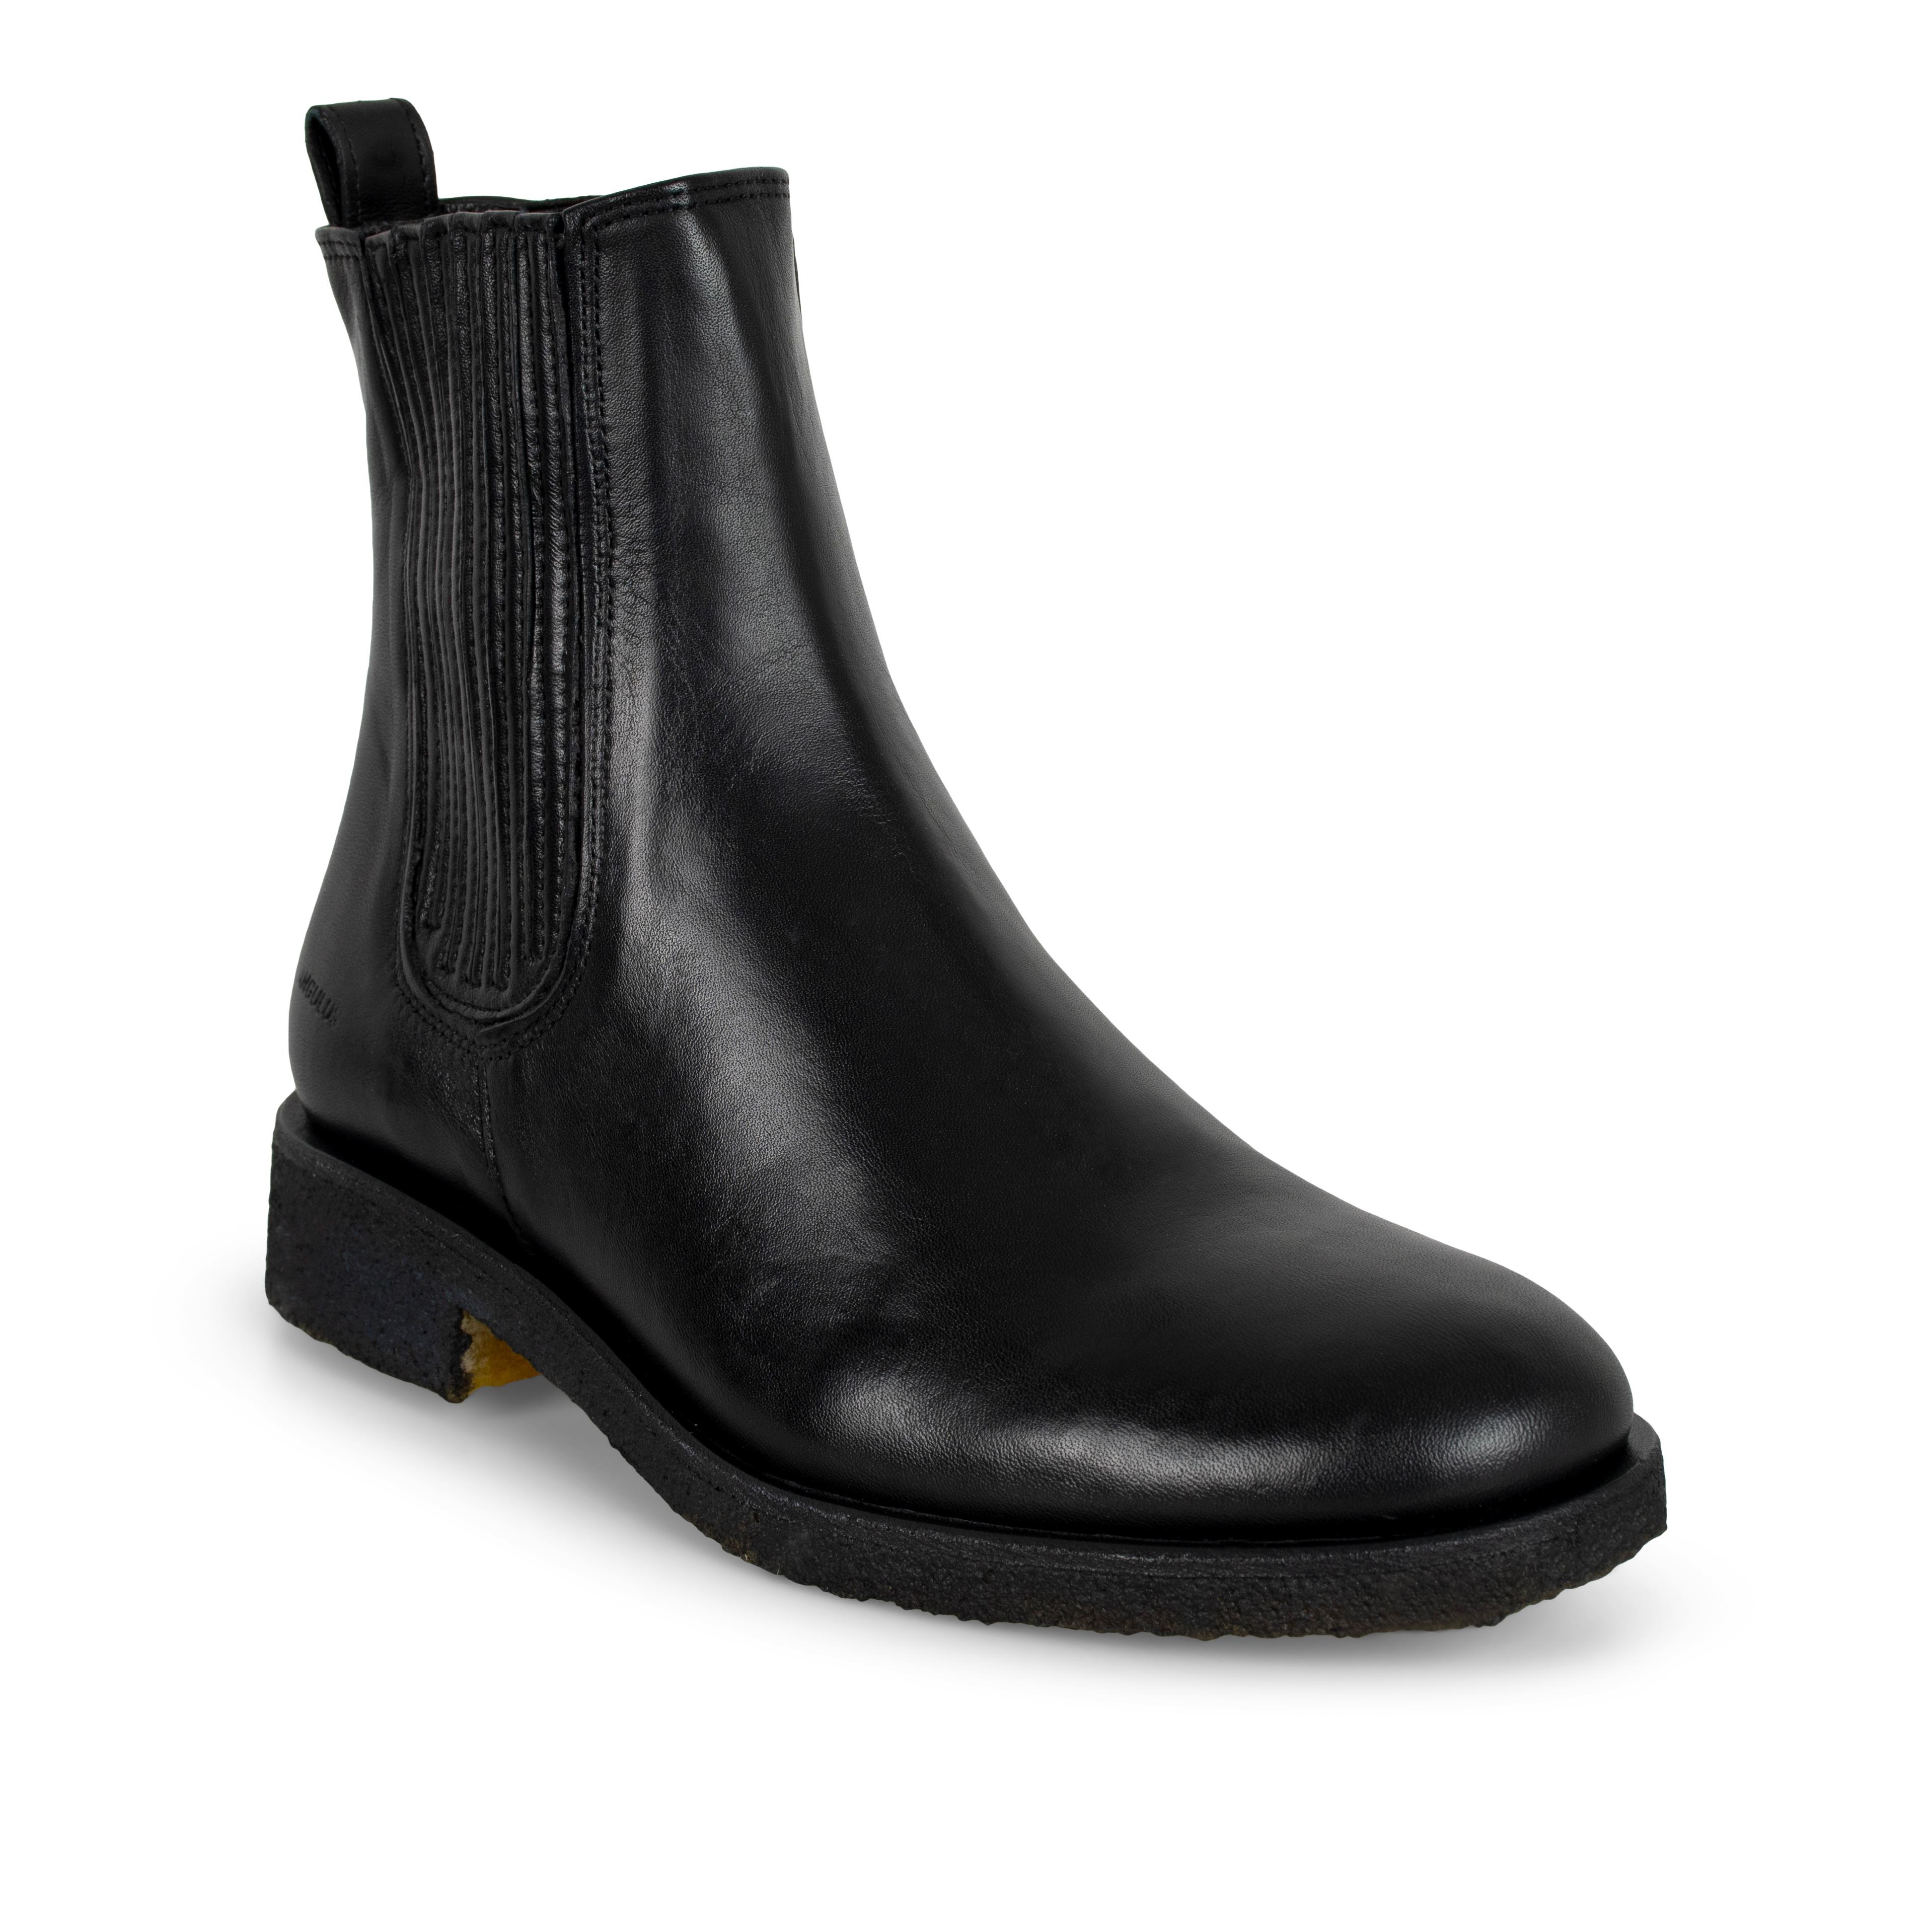 Angulus 7246-103 støvle, black, 36